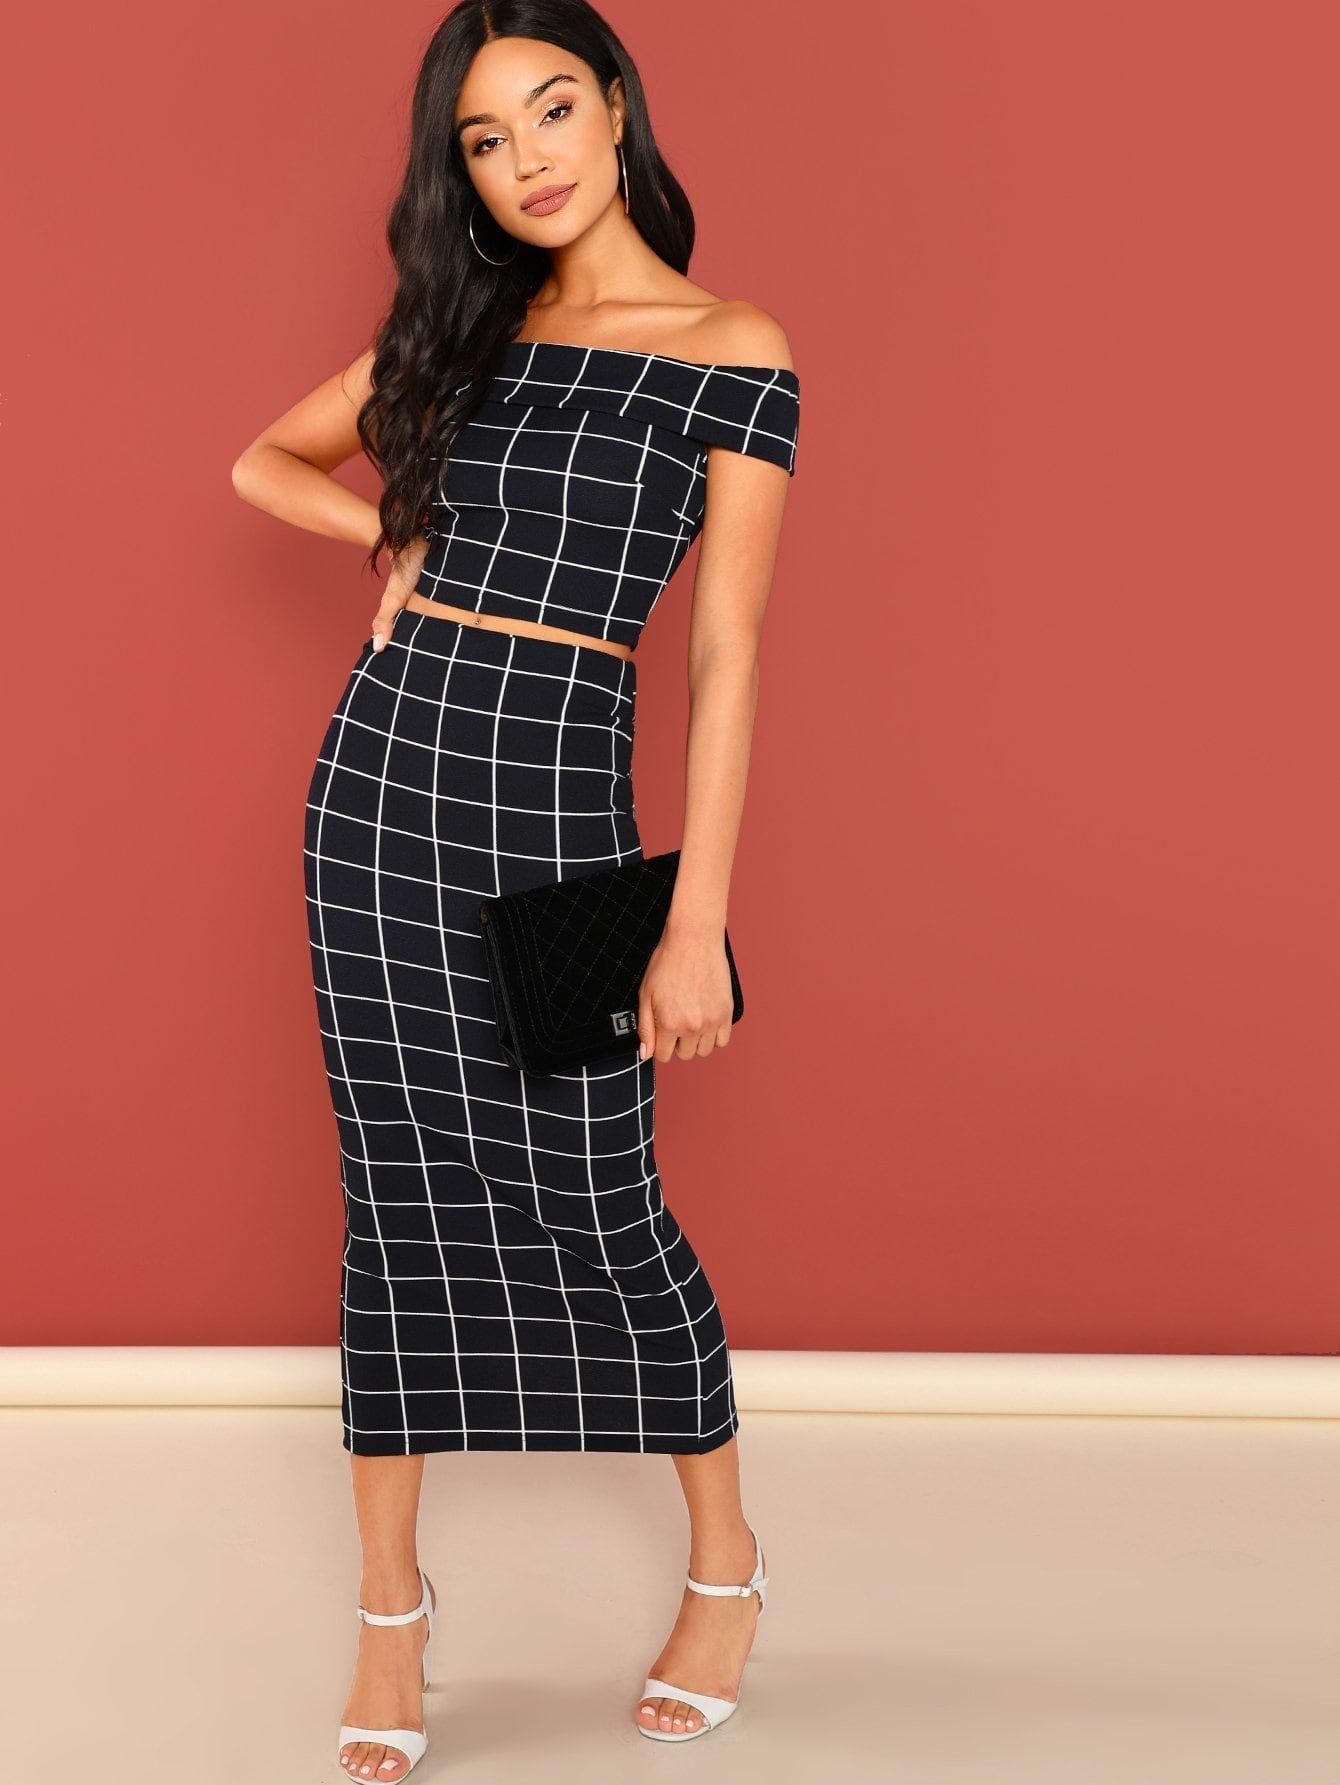 fbf638857a9d8 Grid Crop Bardot Top & Skirt Co-Ord Bardot#Crop#Grid | Fashions ...